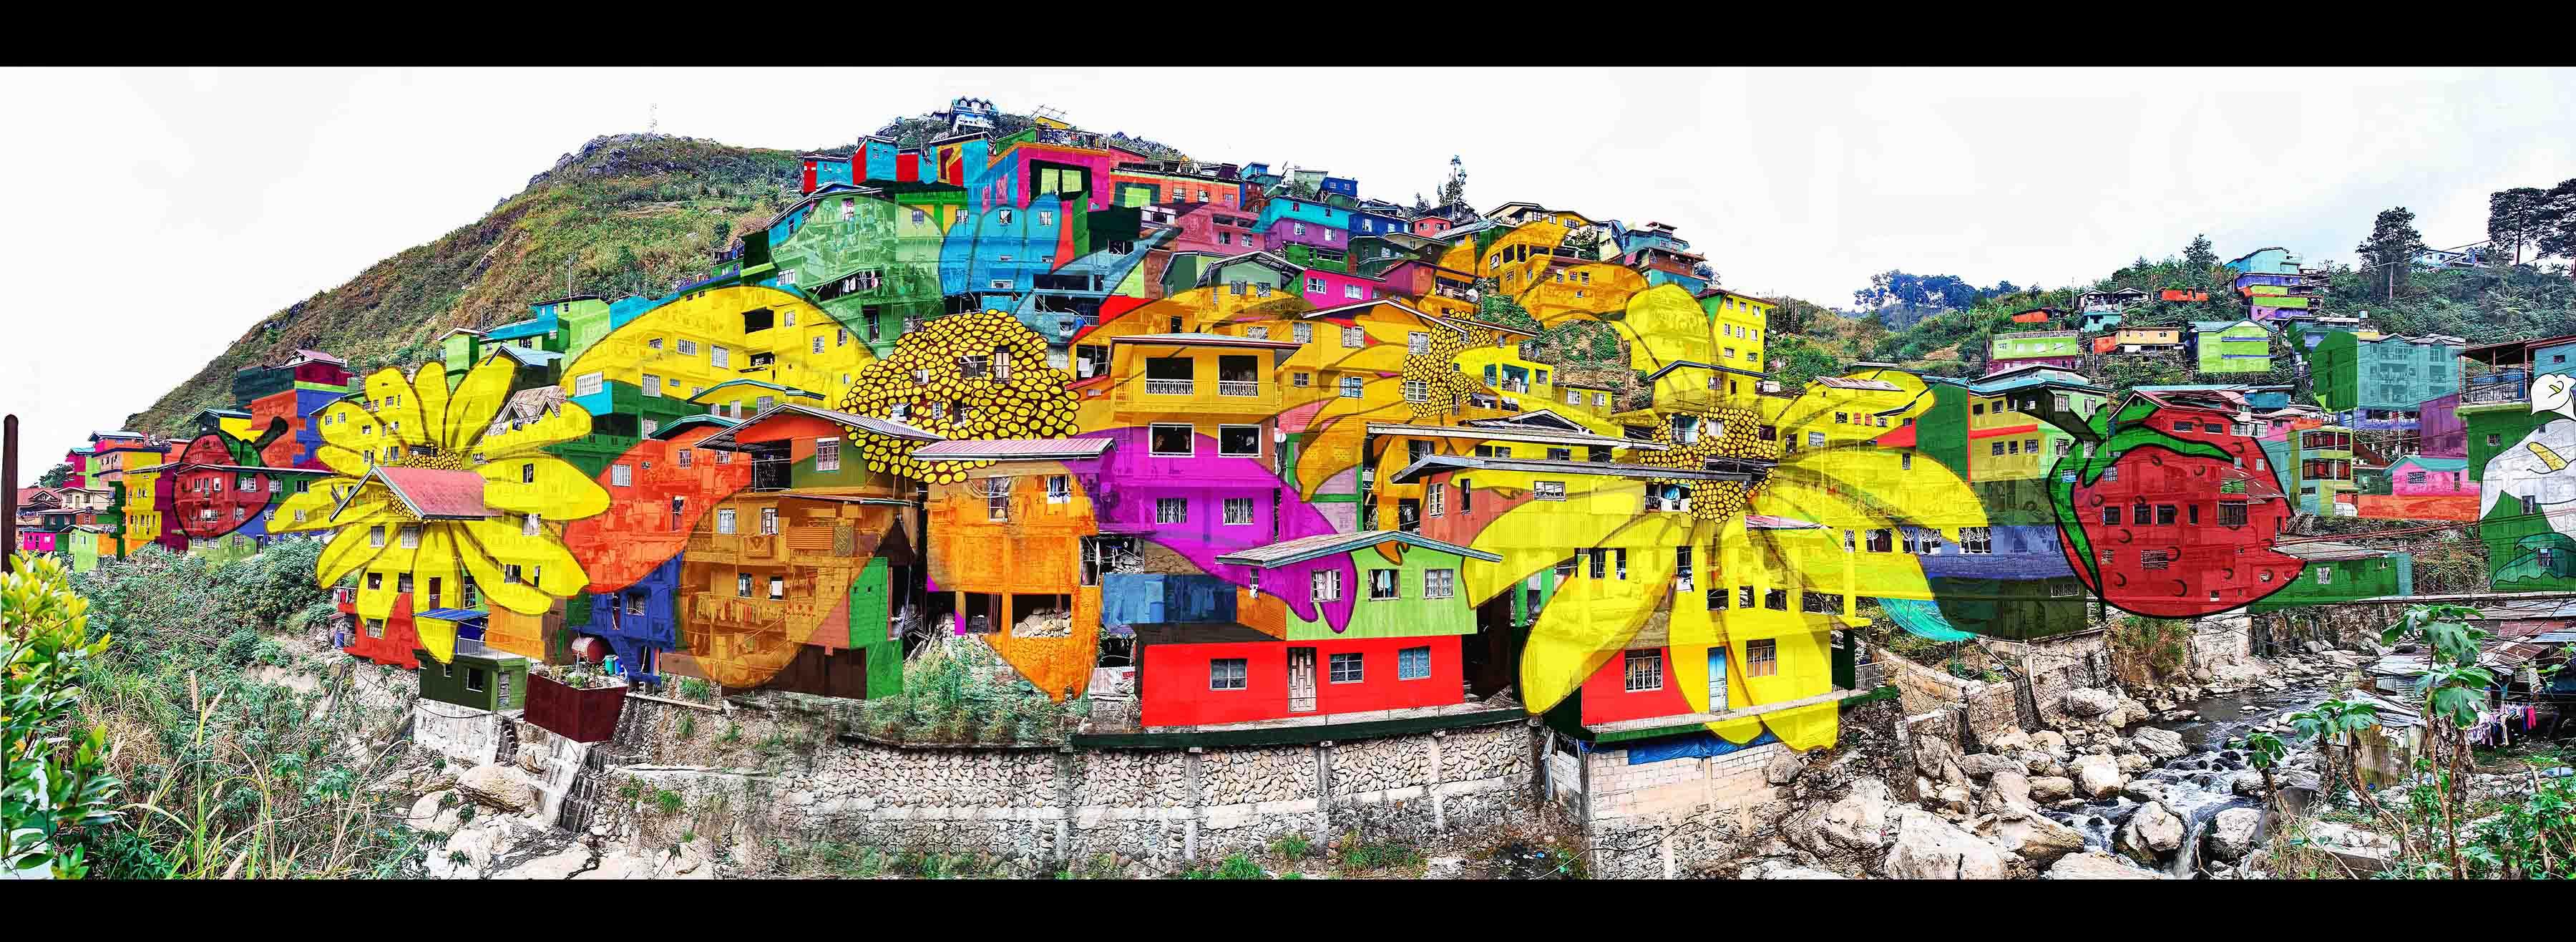 This Gigantic Community-wide Artwork In La Trinidad Is Stunning